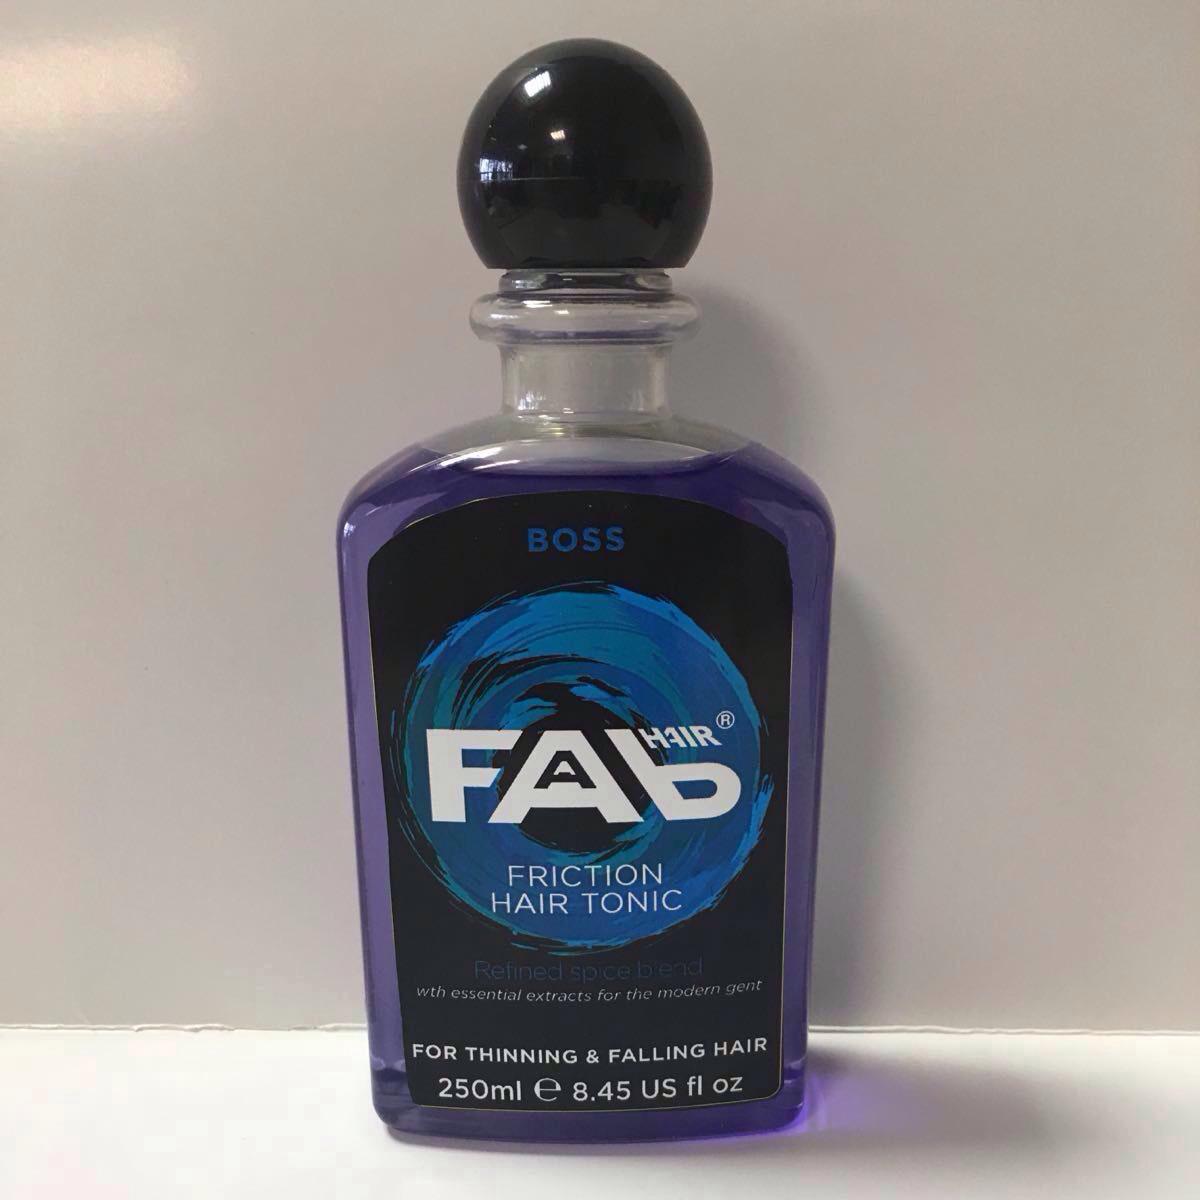 boss FAB hair friction tonic